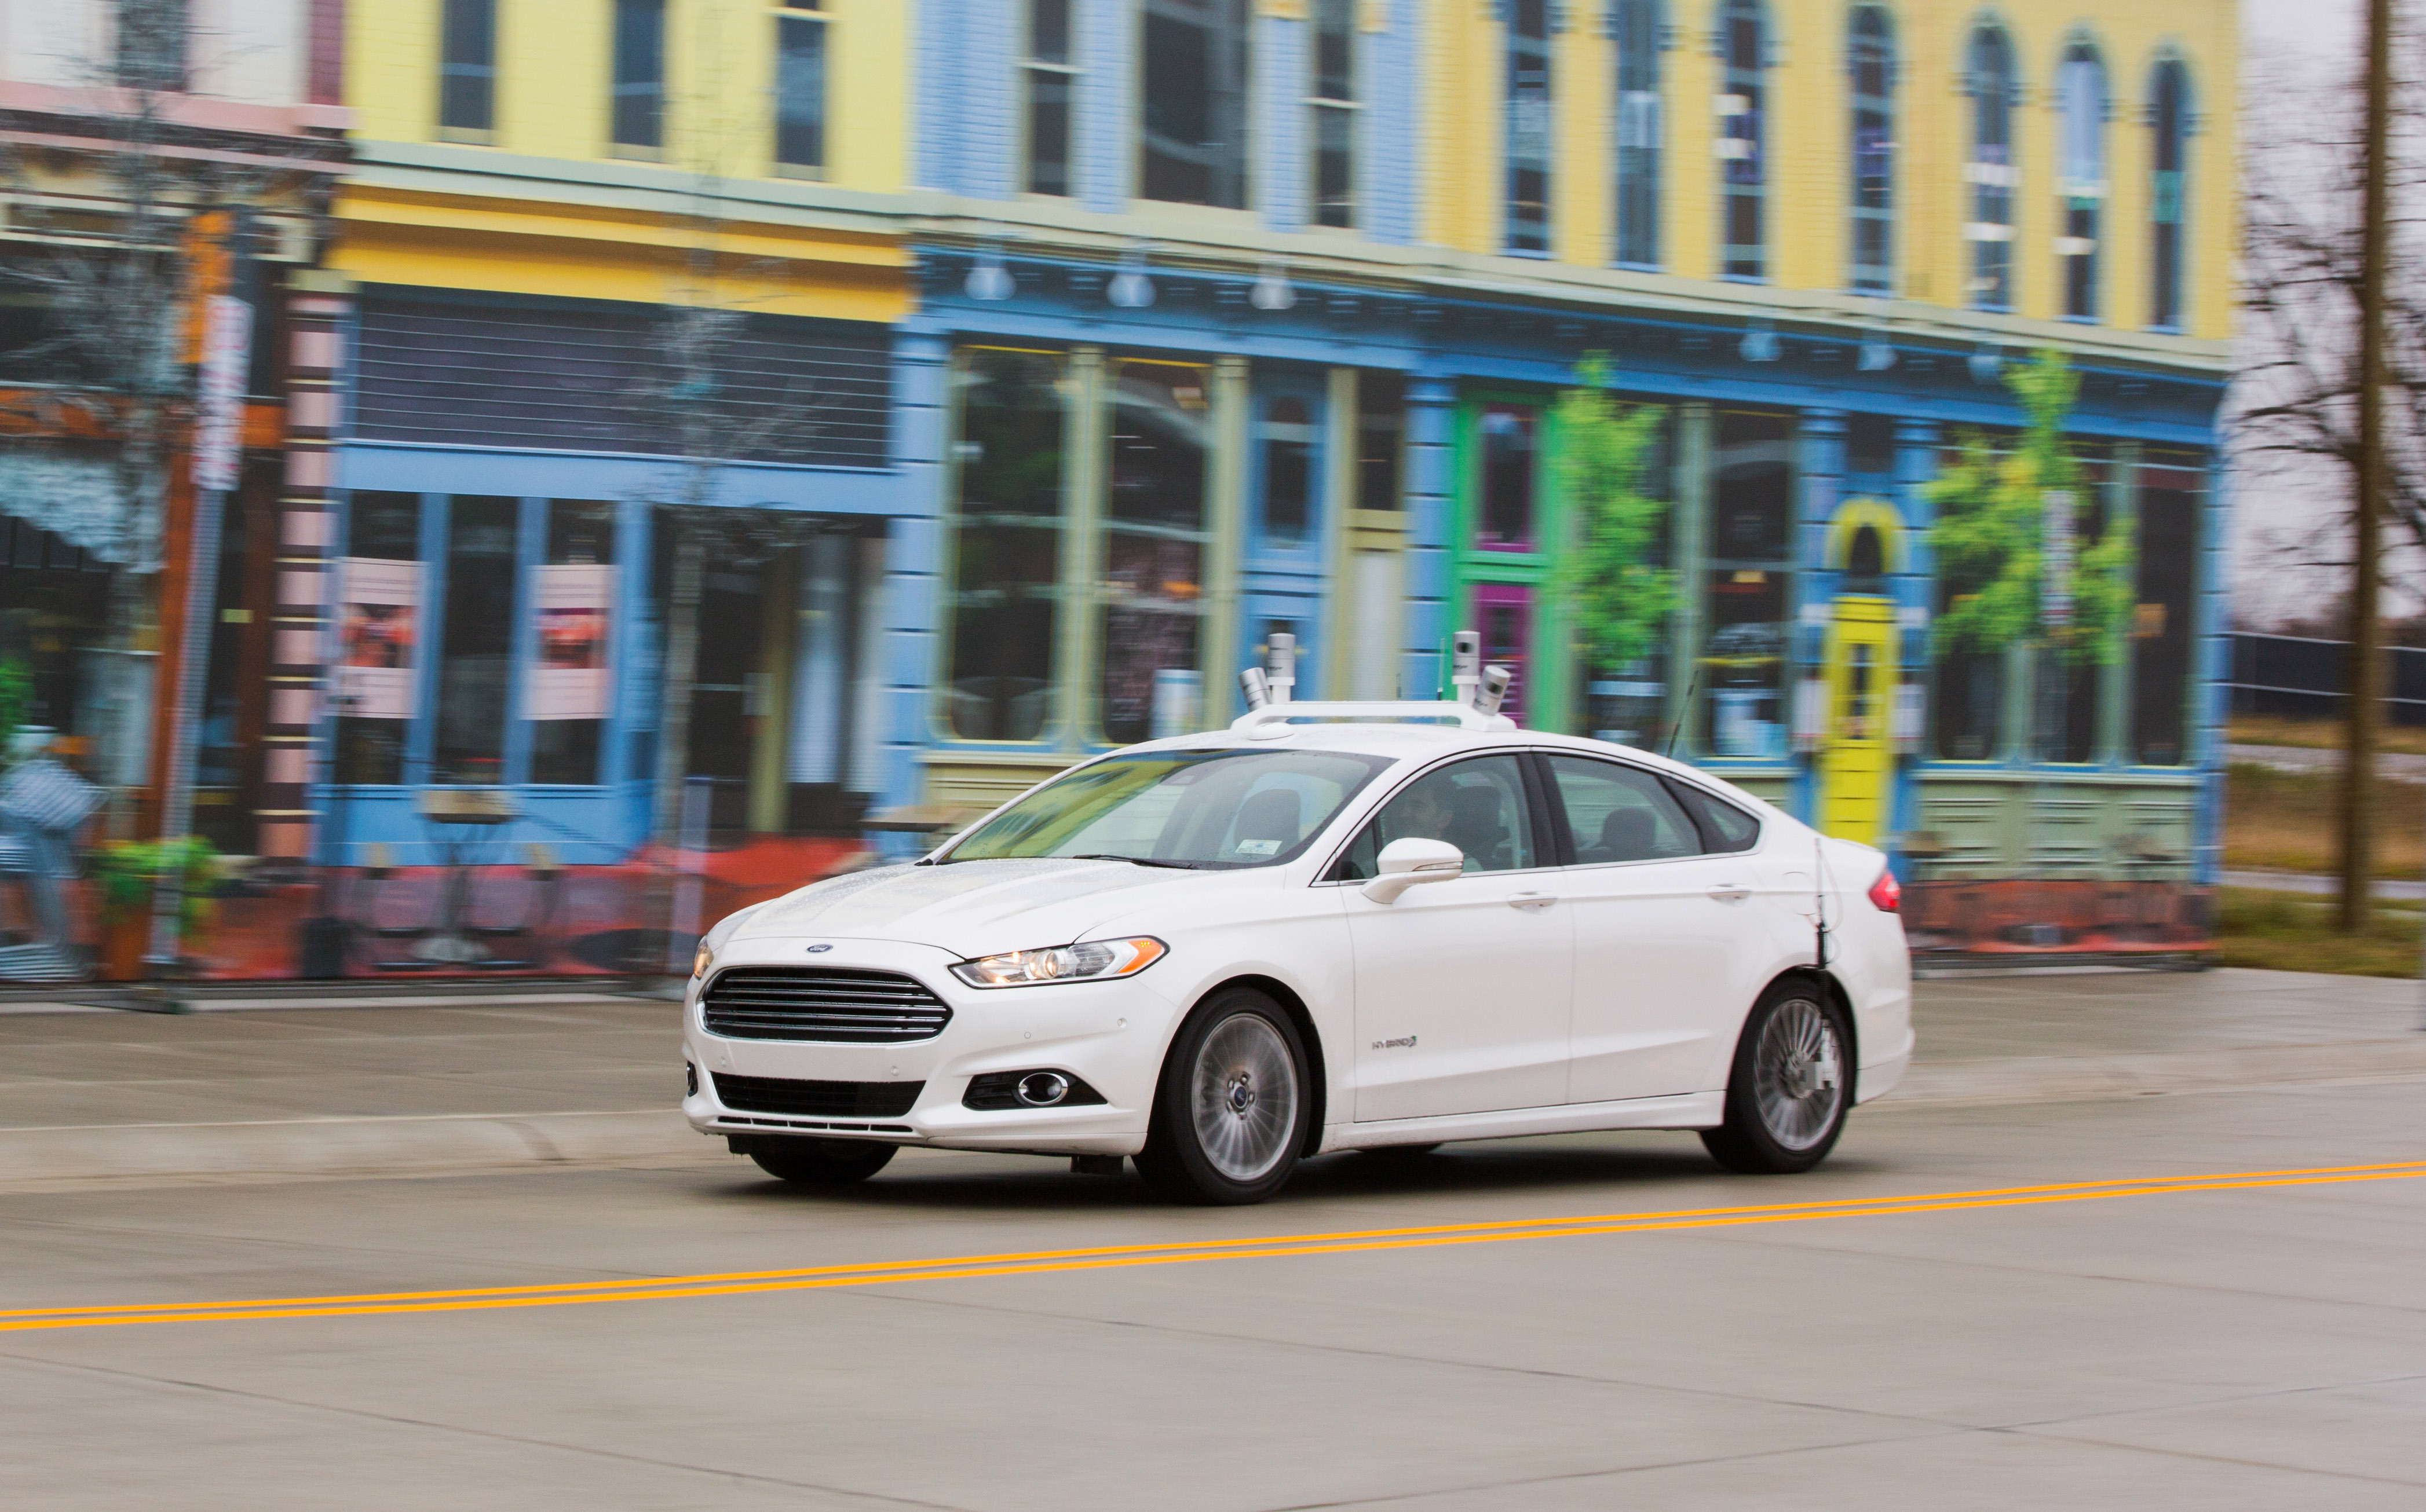 Ford Tripling Autonomous Vehicle Development Fleet, Accelerating On ...